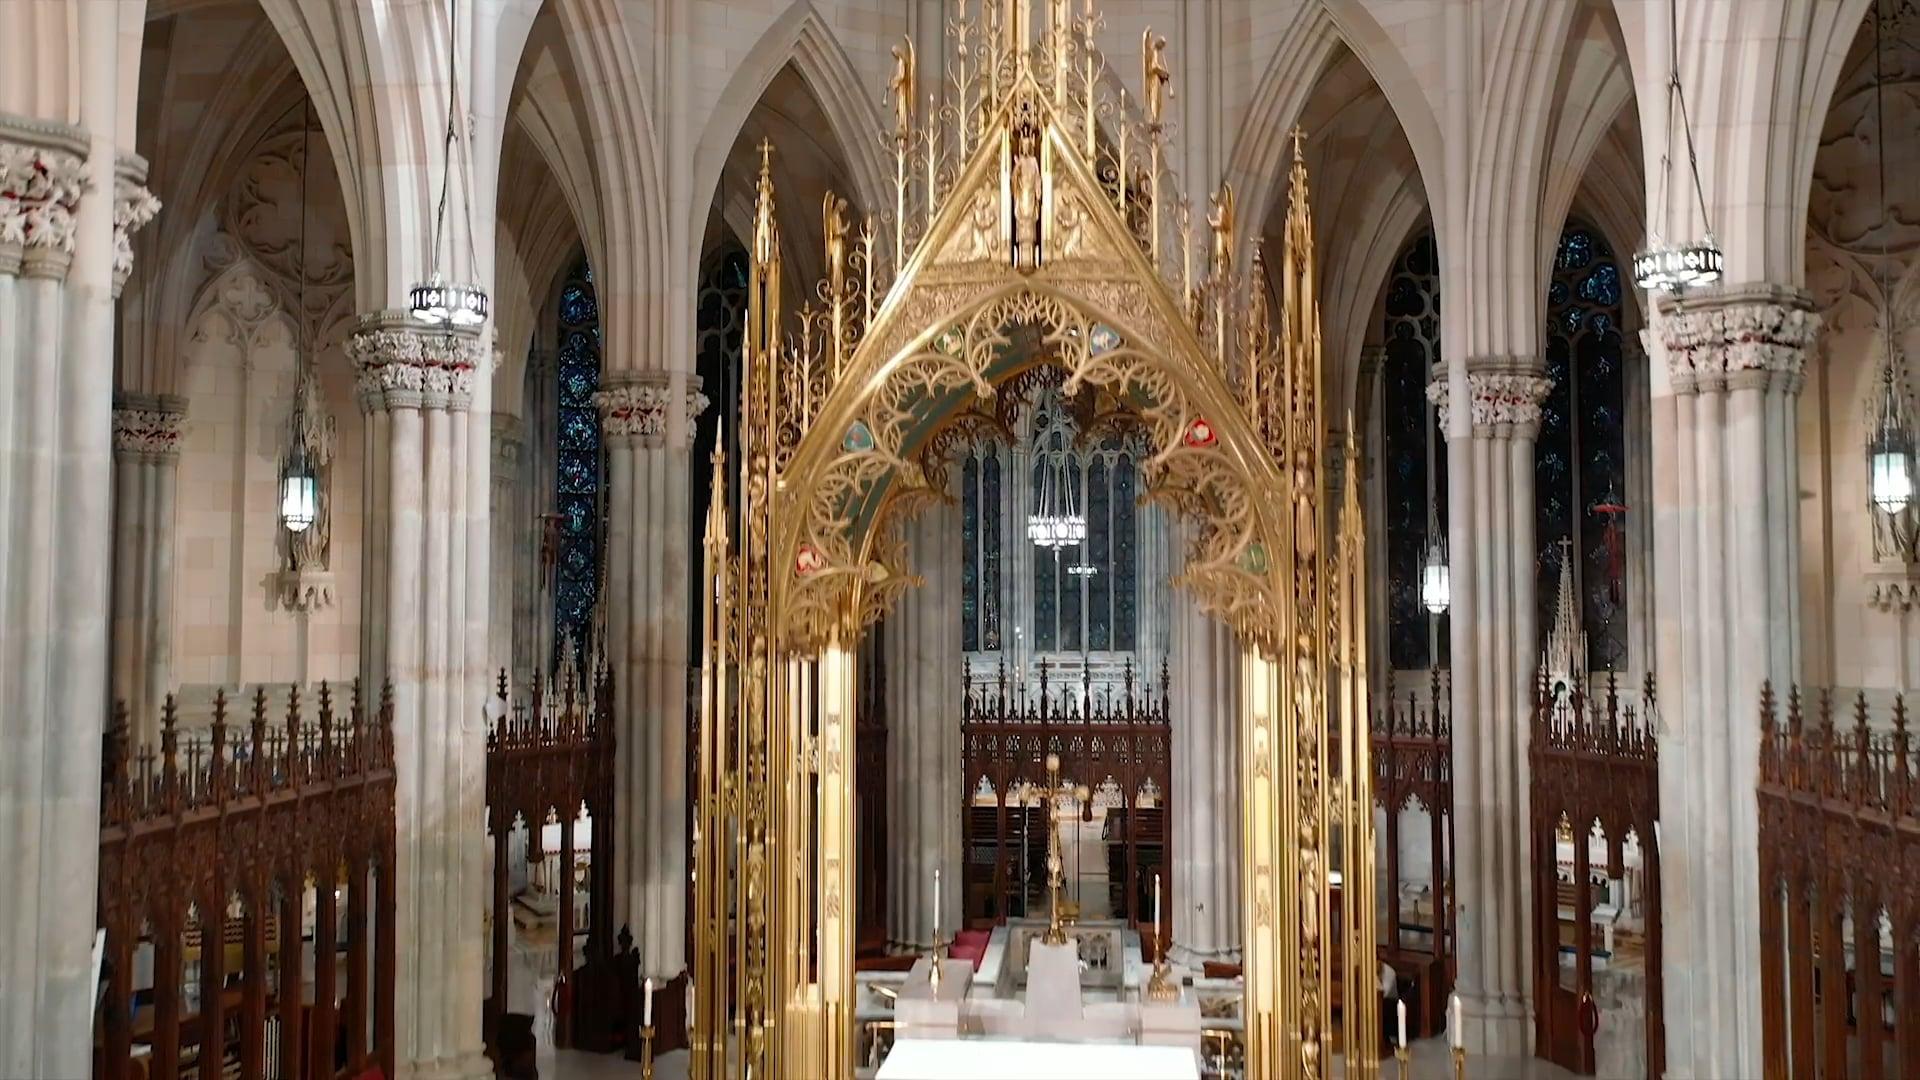 The Rosary: Luminous Mysteries led by Msgr. Joseph LaMorte